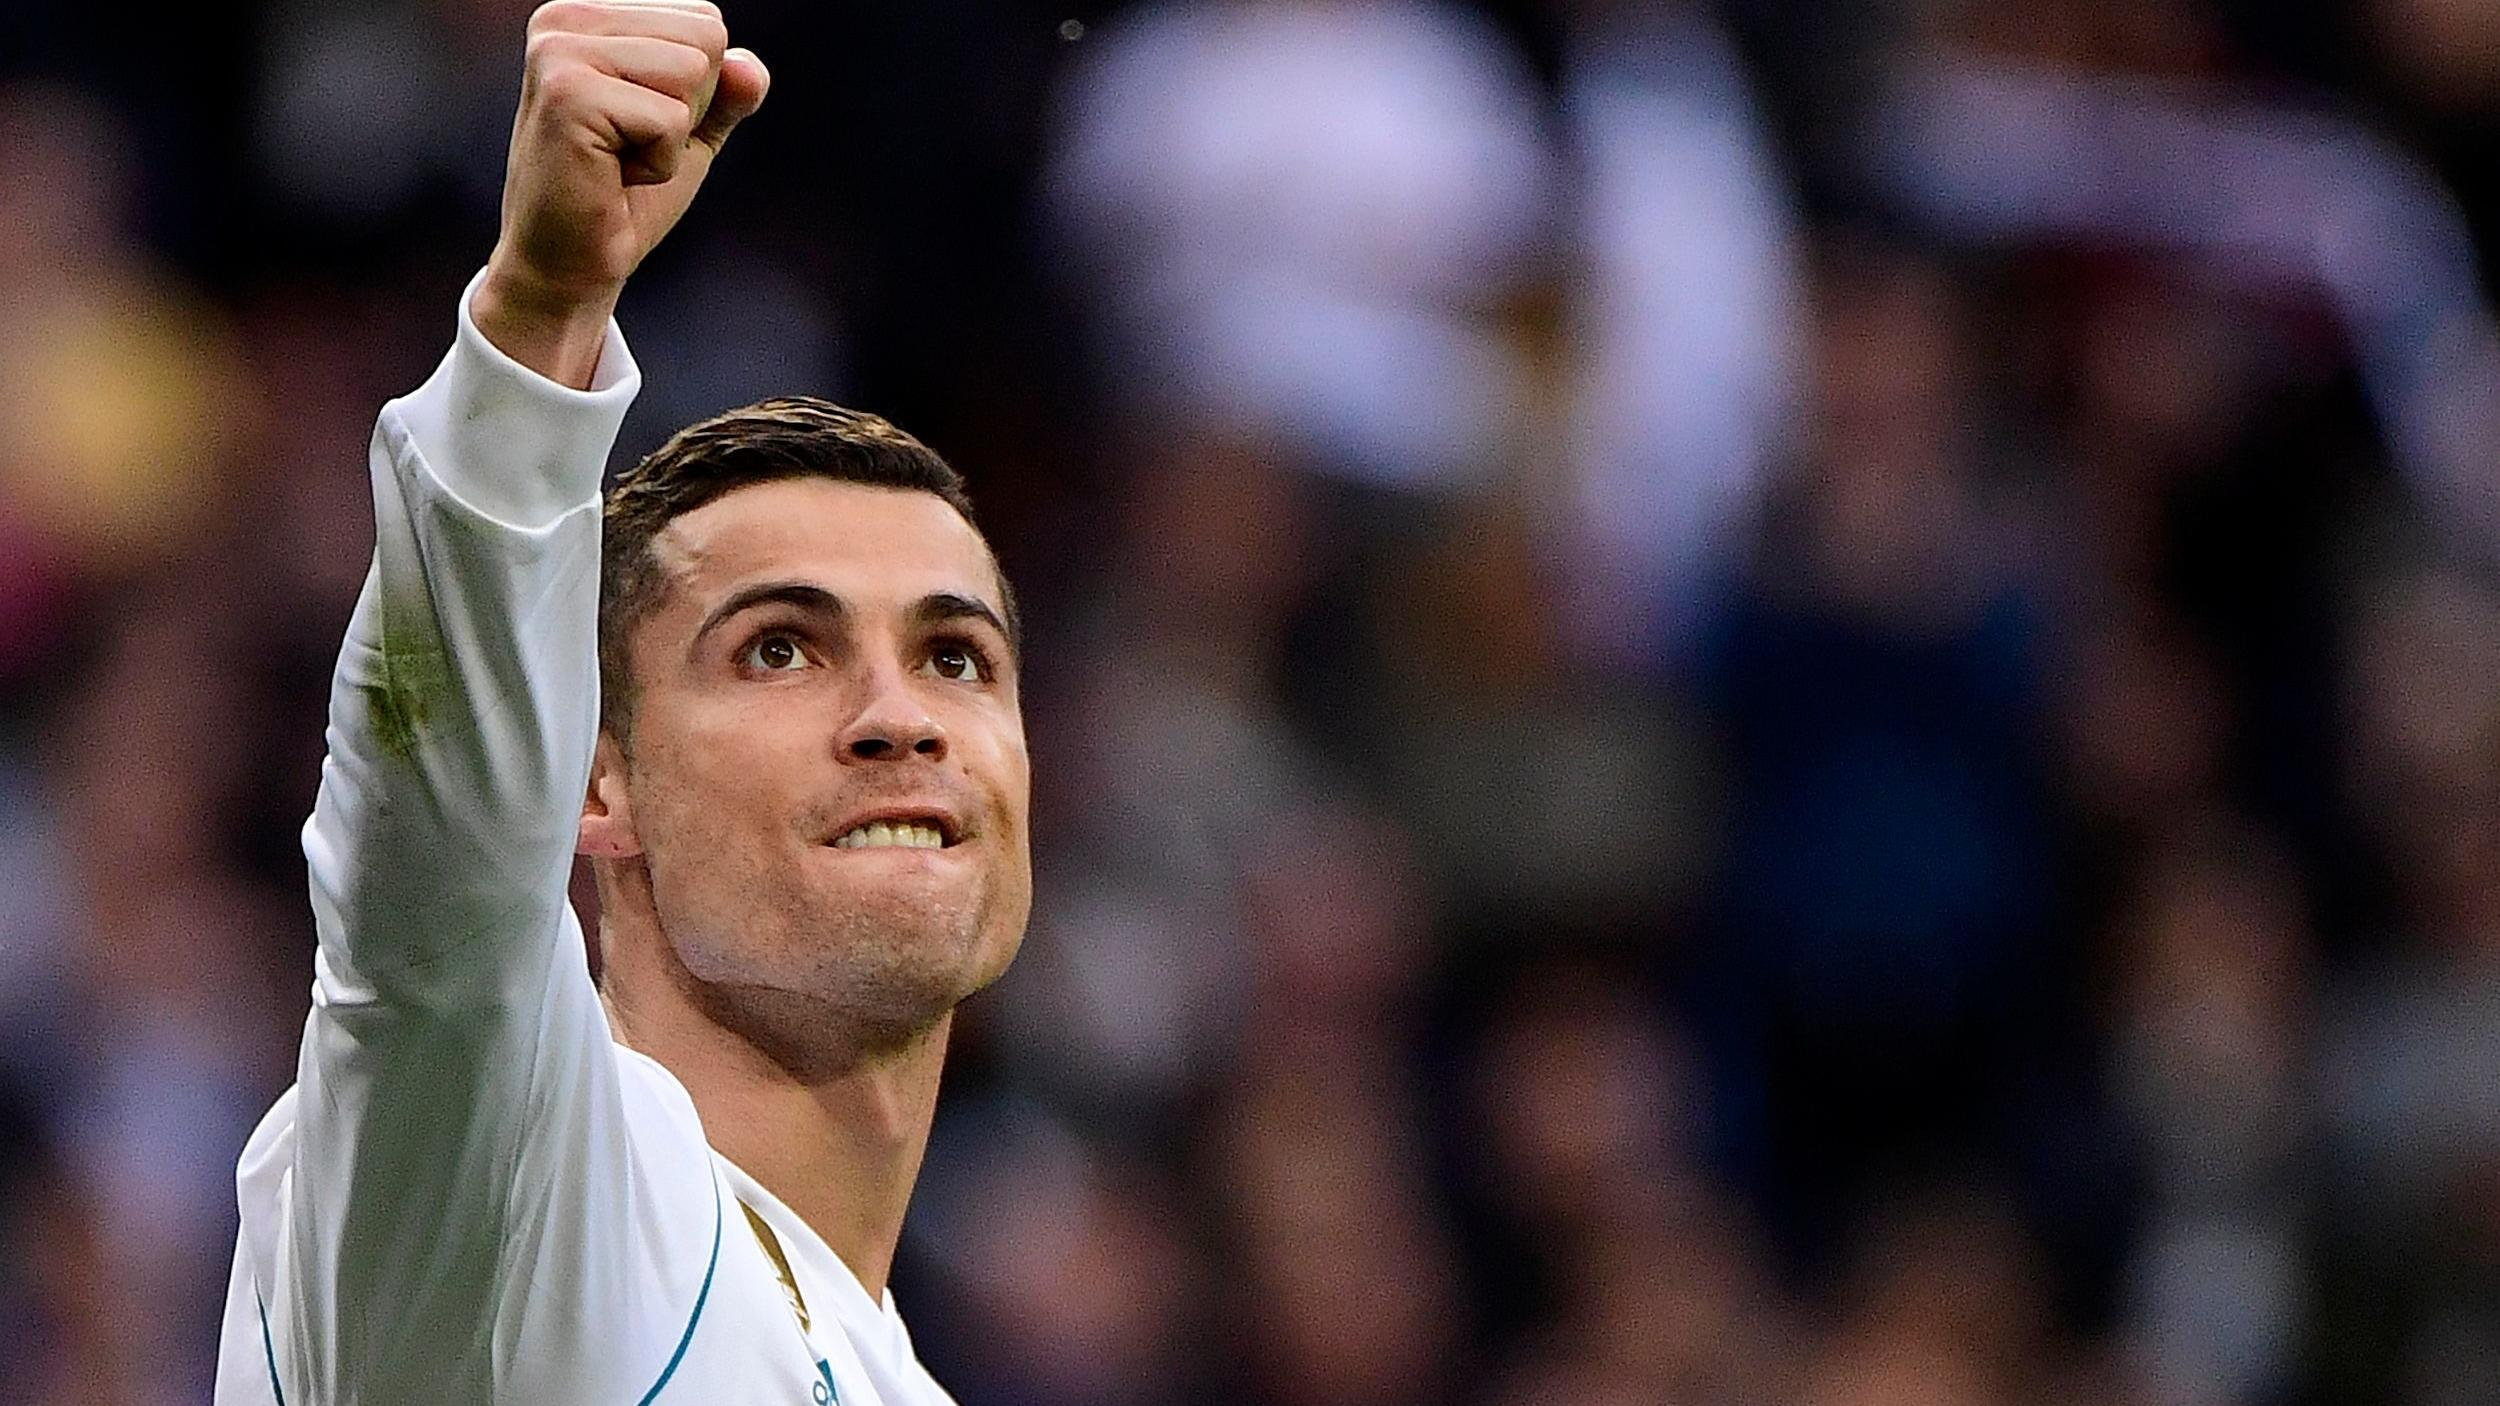 172f8c524 Dlaczego Cristiano Ronaldo trafi akurat do Juventusu? - Piłka nożna